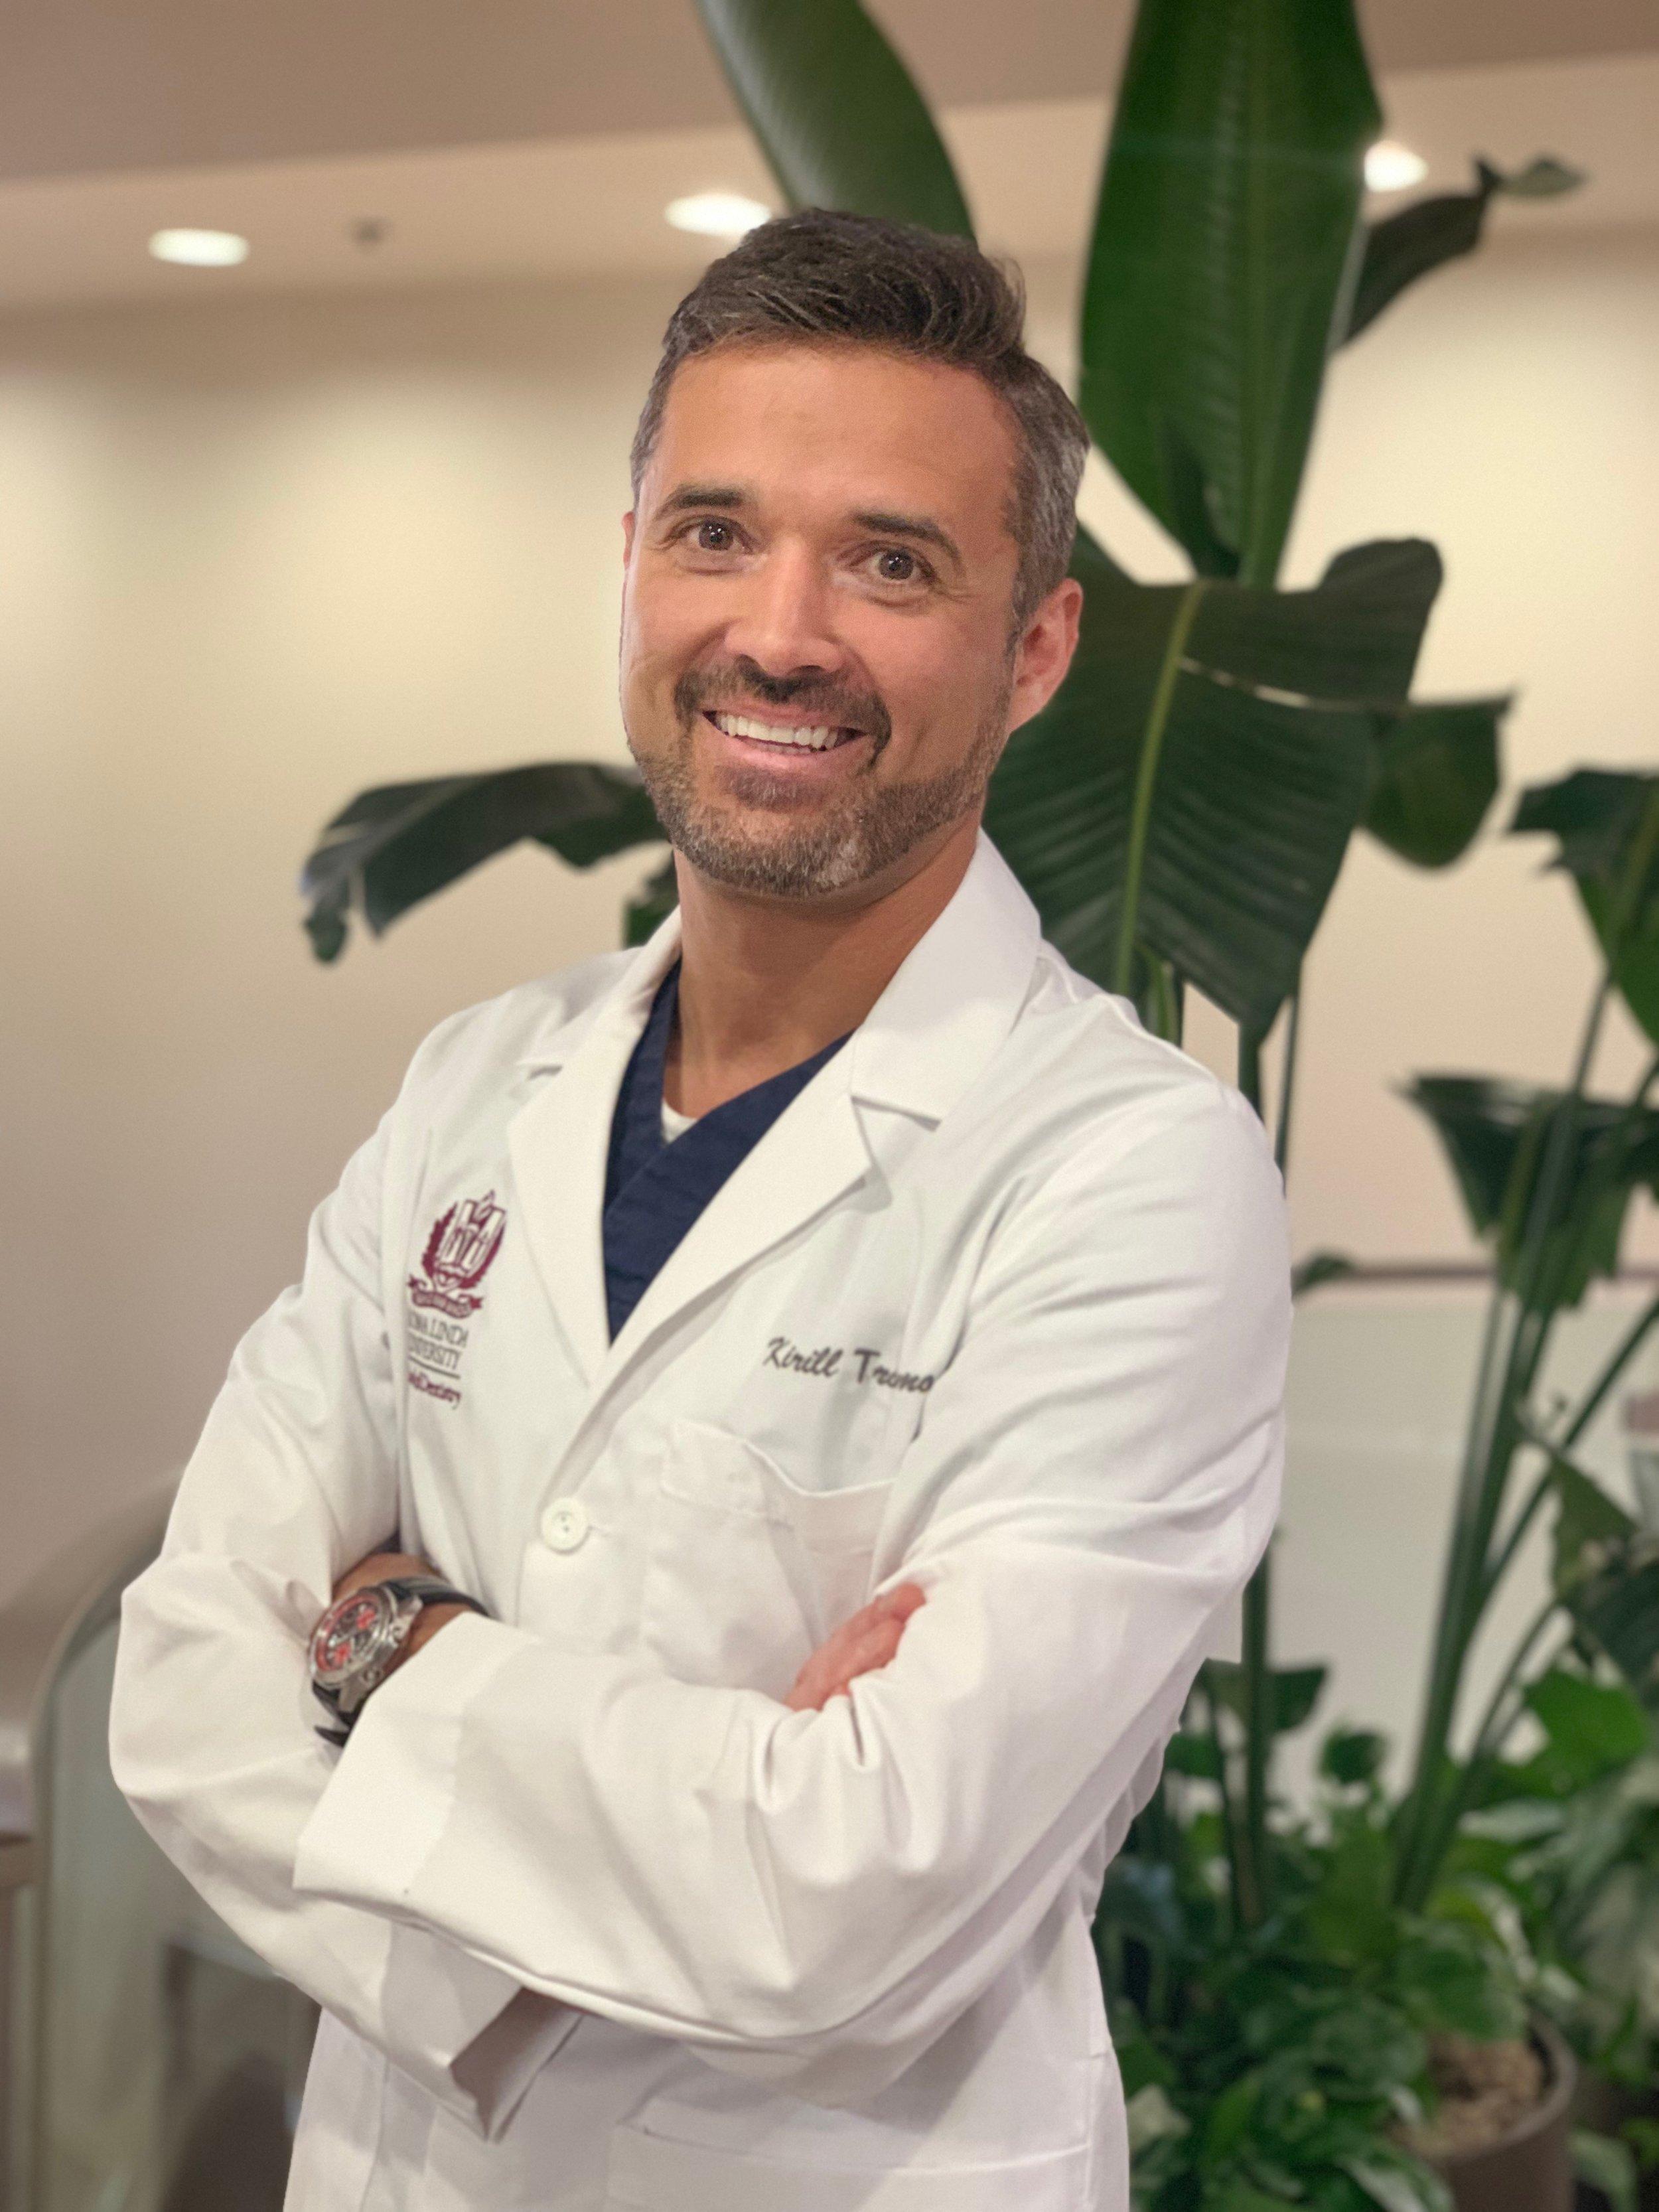 Dr. Kirill Trofimov